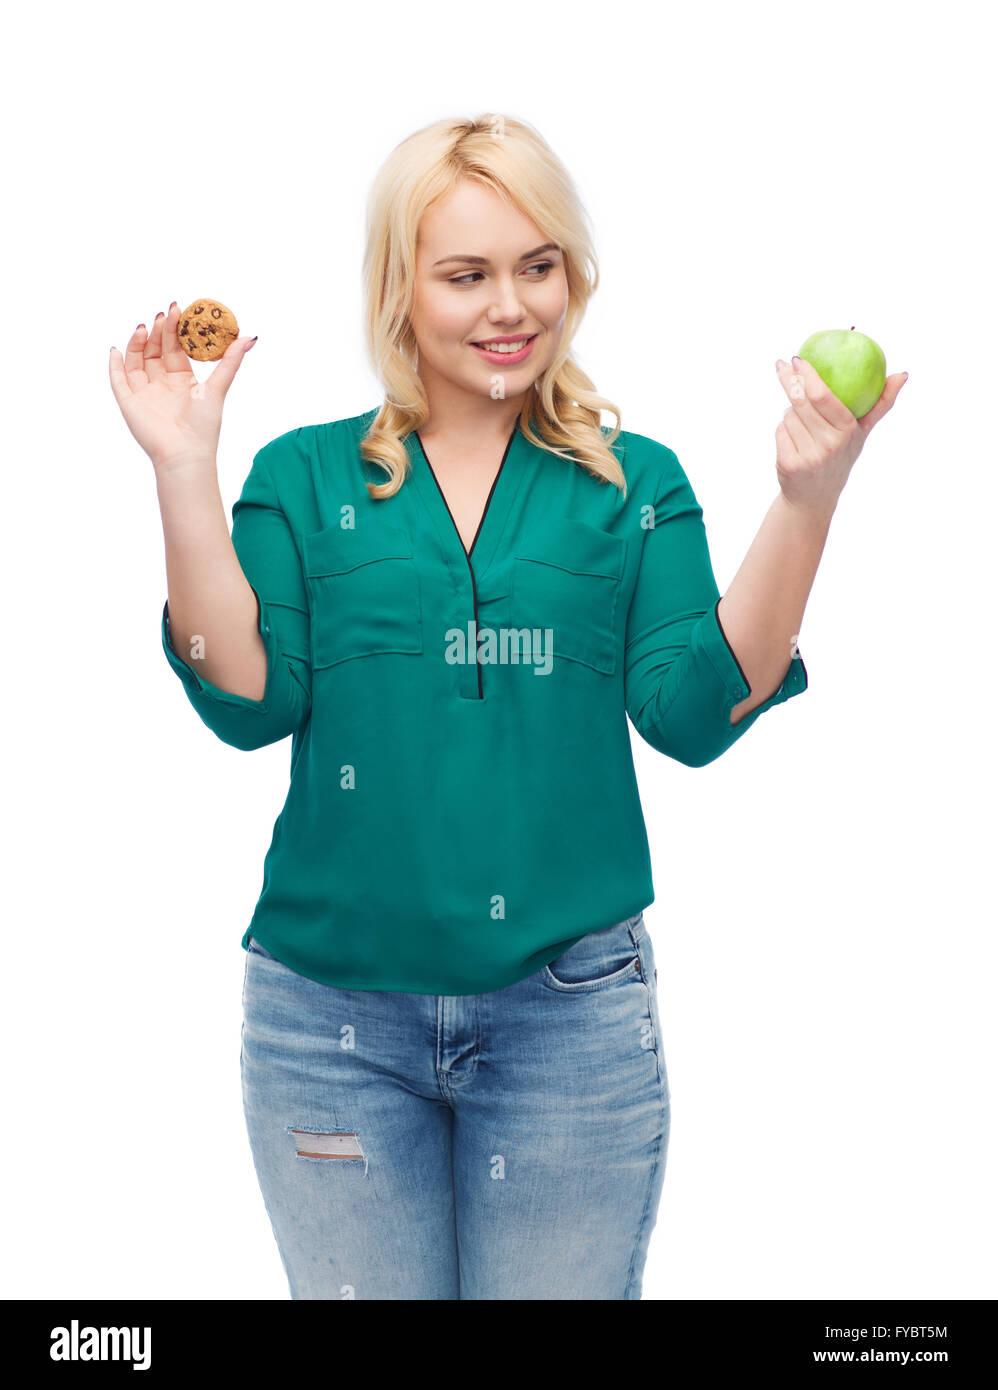 smiling woman choosing between apple and cookie - Stock Image